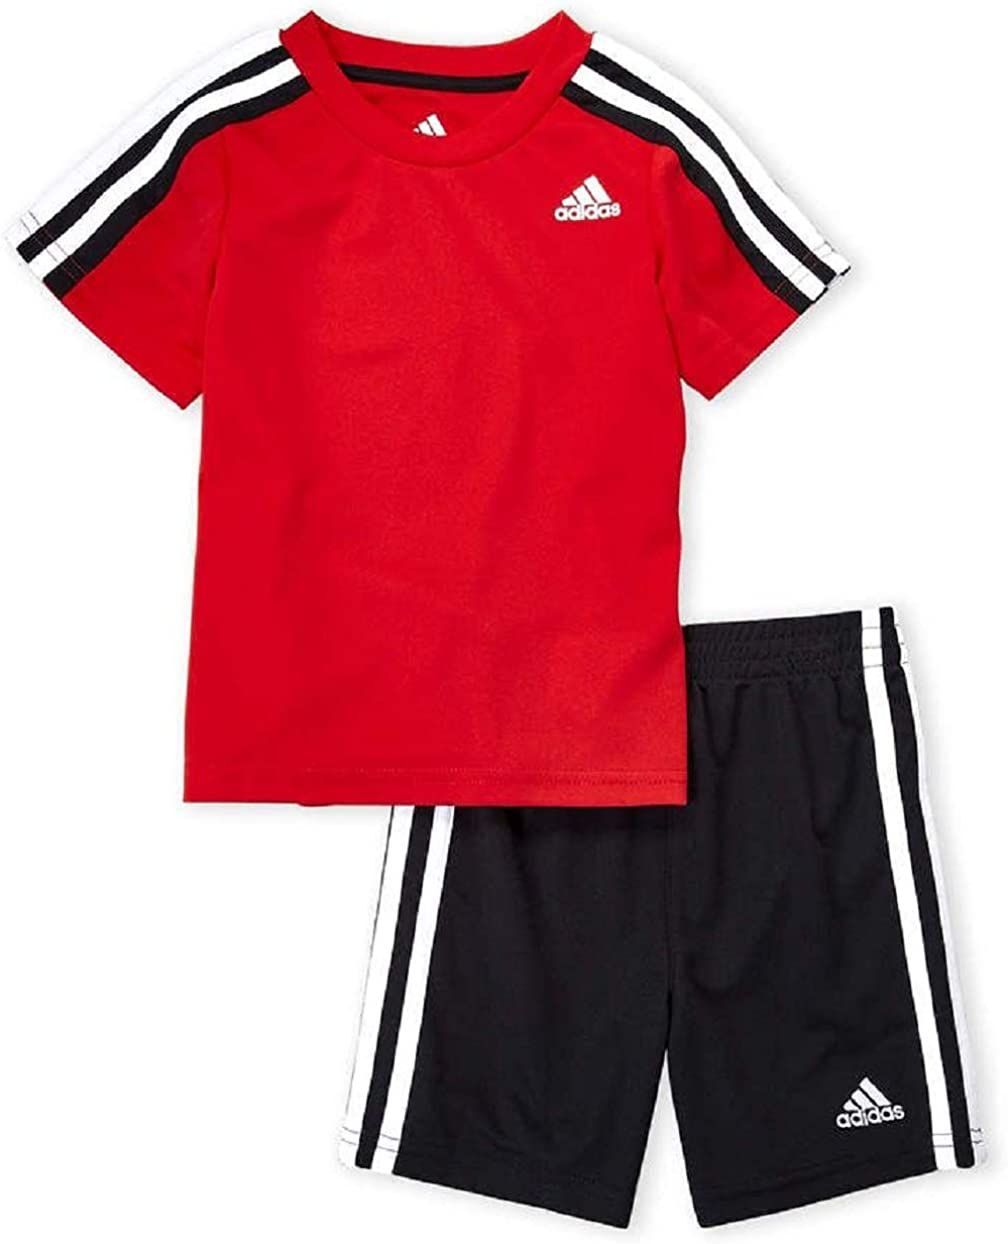 adidas Boys Striped Three Stripes Active Sport Tee T-Shirt & Shorts Set Red/Black